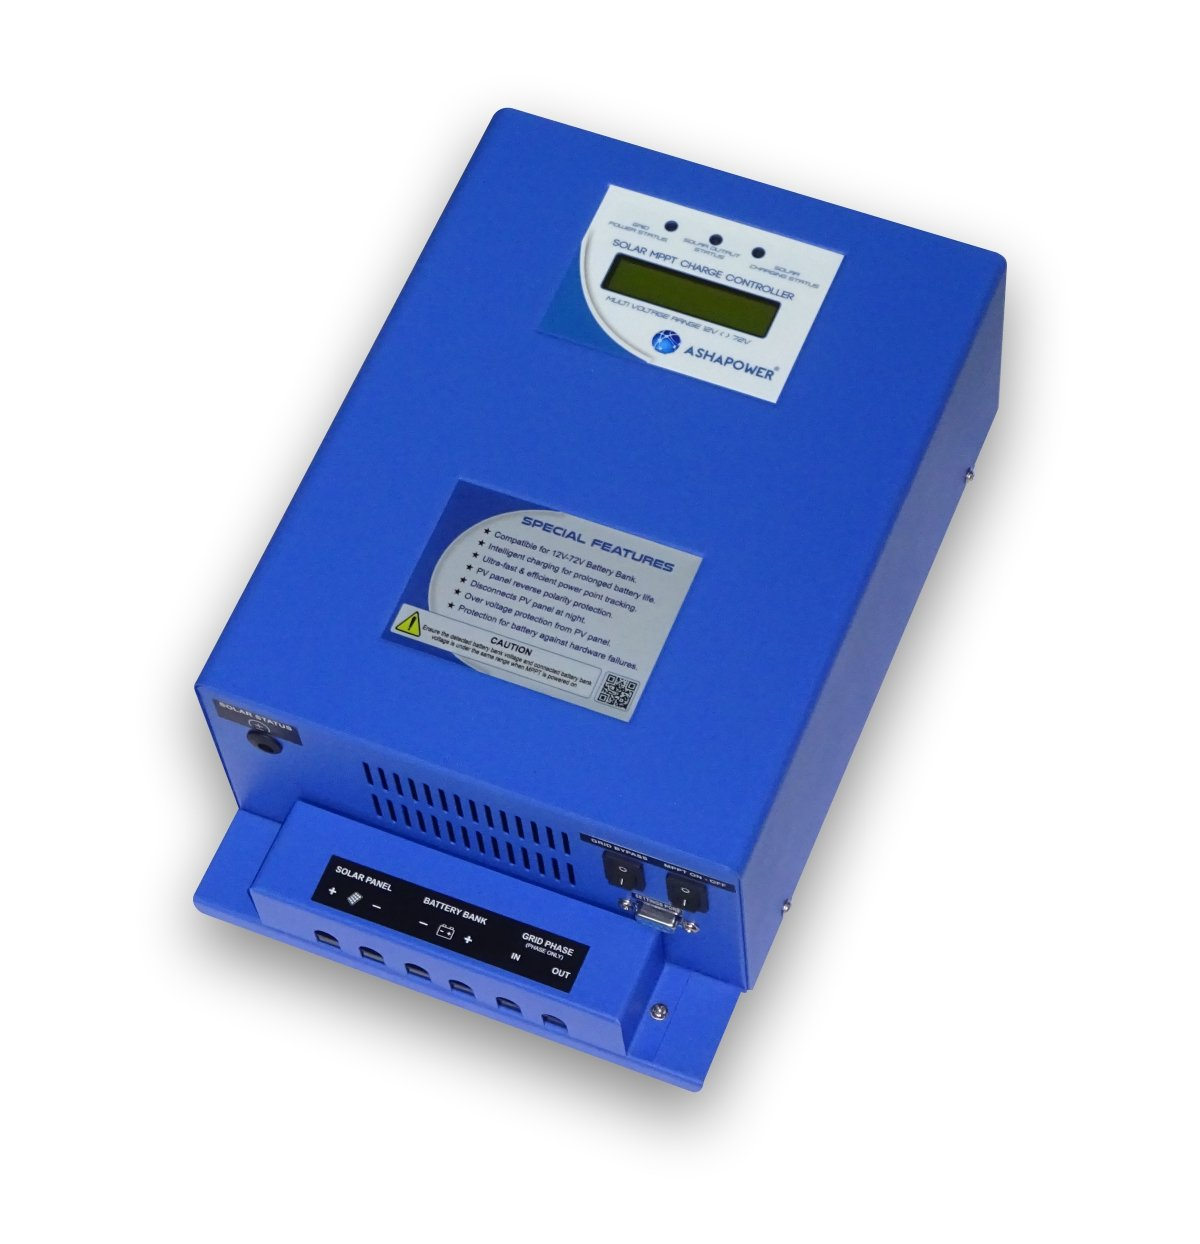 Ashapower Solar Mppt Charge Controller 24 36 48 60 72 V 40a Auto Circuit Diagram On Tracker Setting Apollo 40 Blue Garden Outdoors